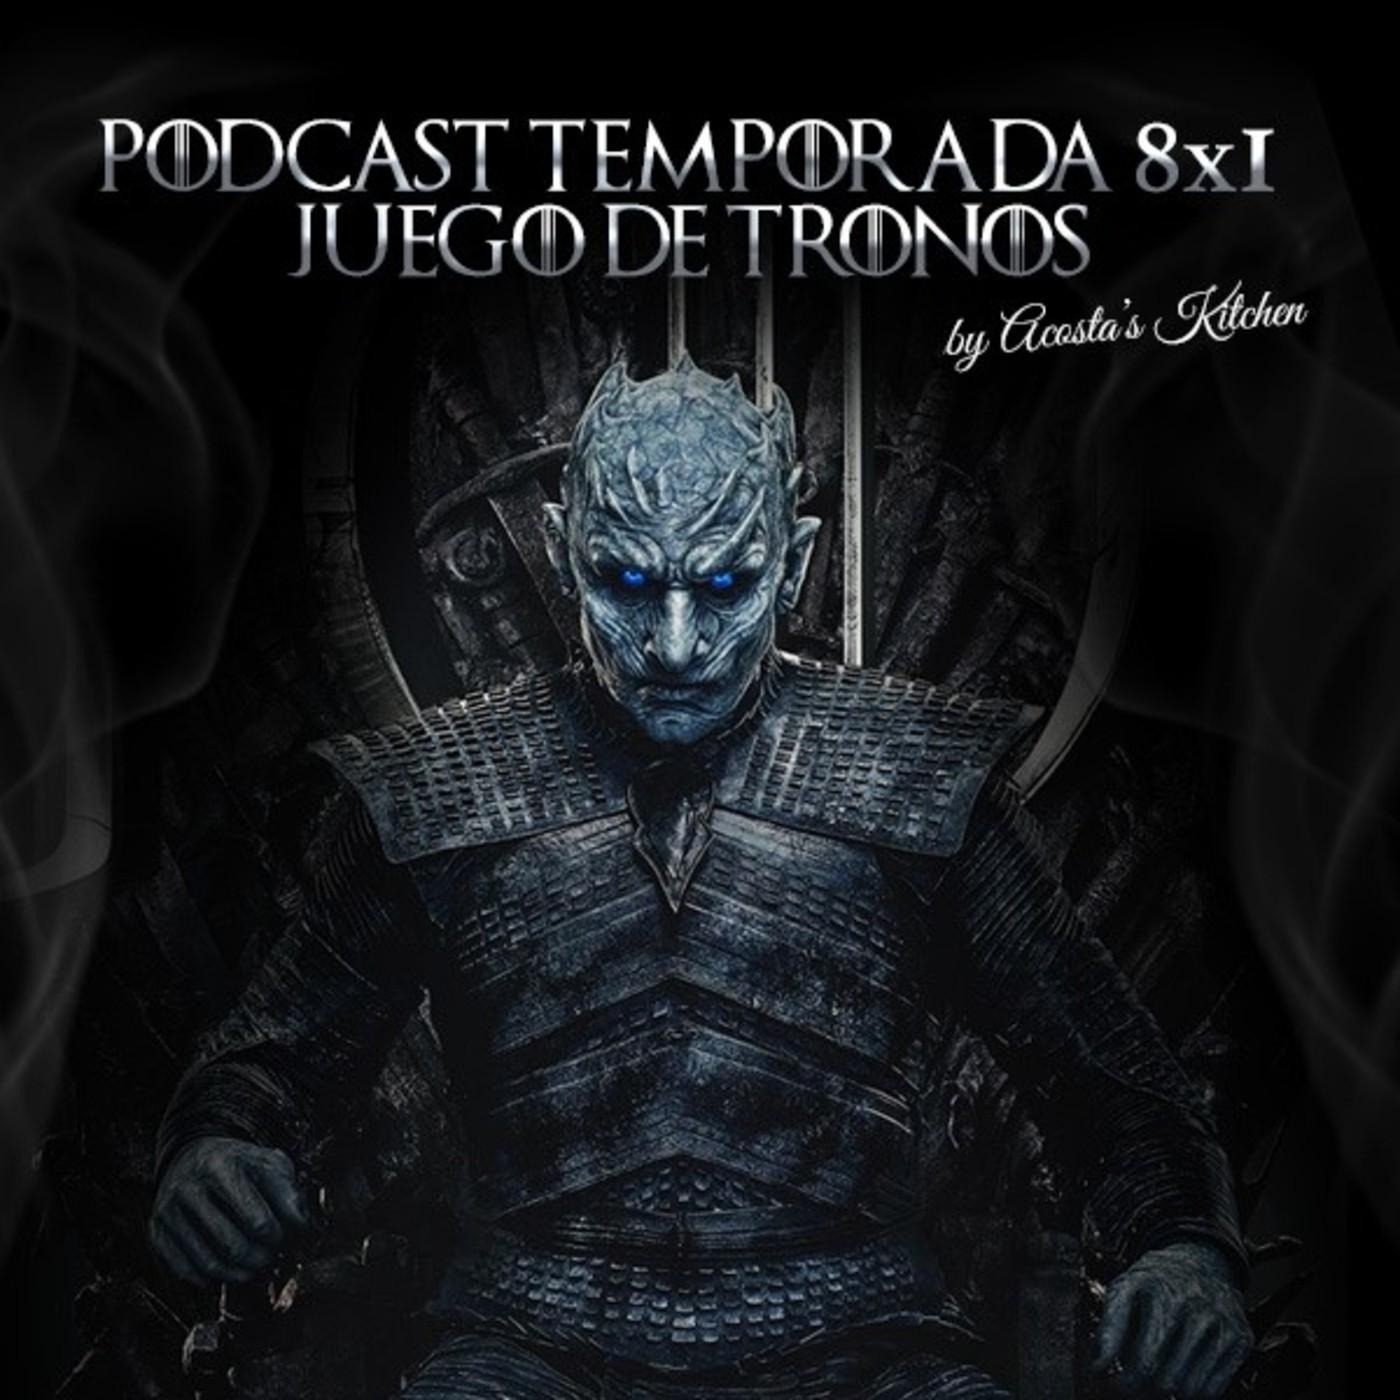 Podcast análisis Capítulo 1 Temporada 8 de Juego de Tronos ...